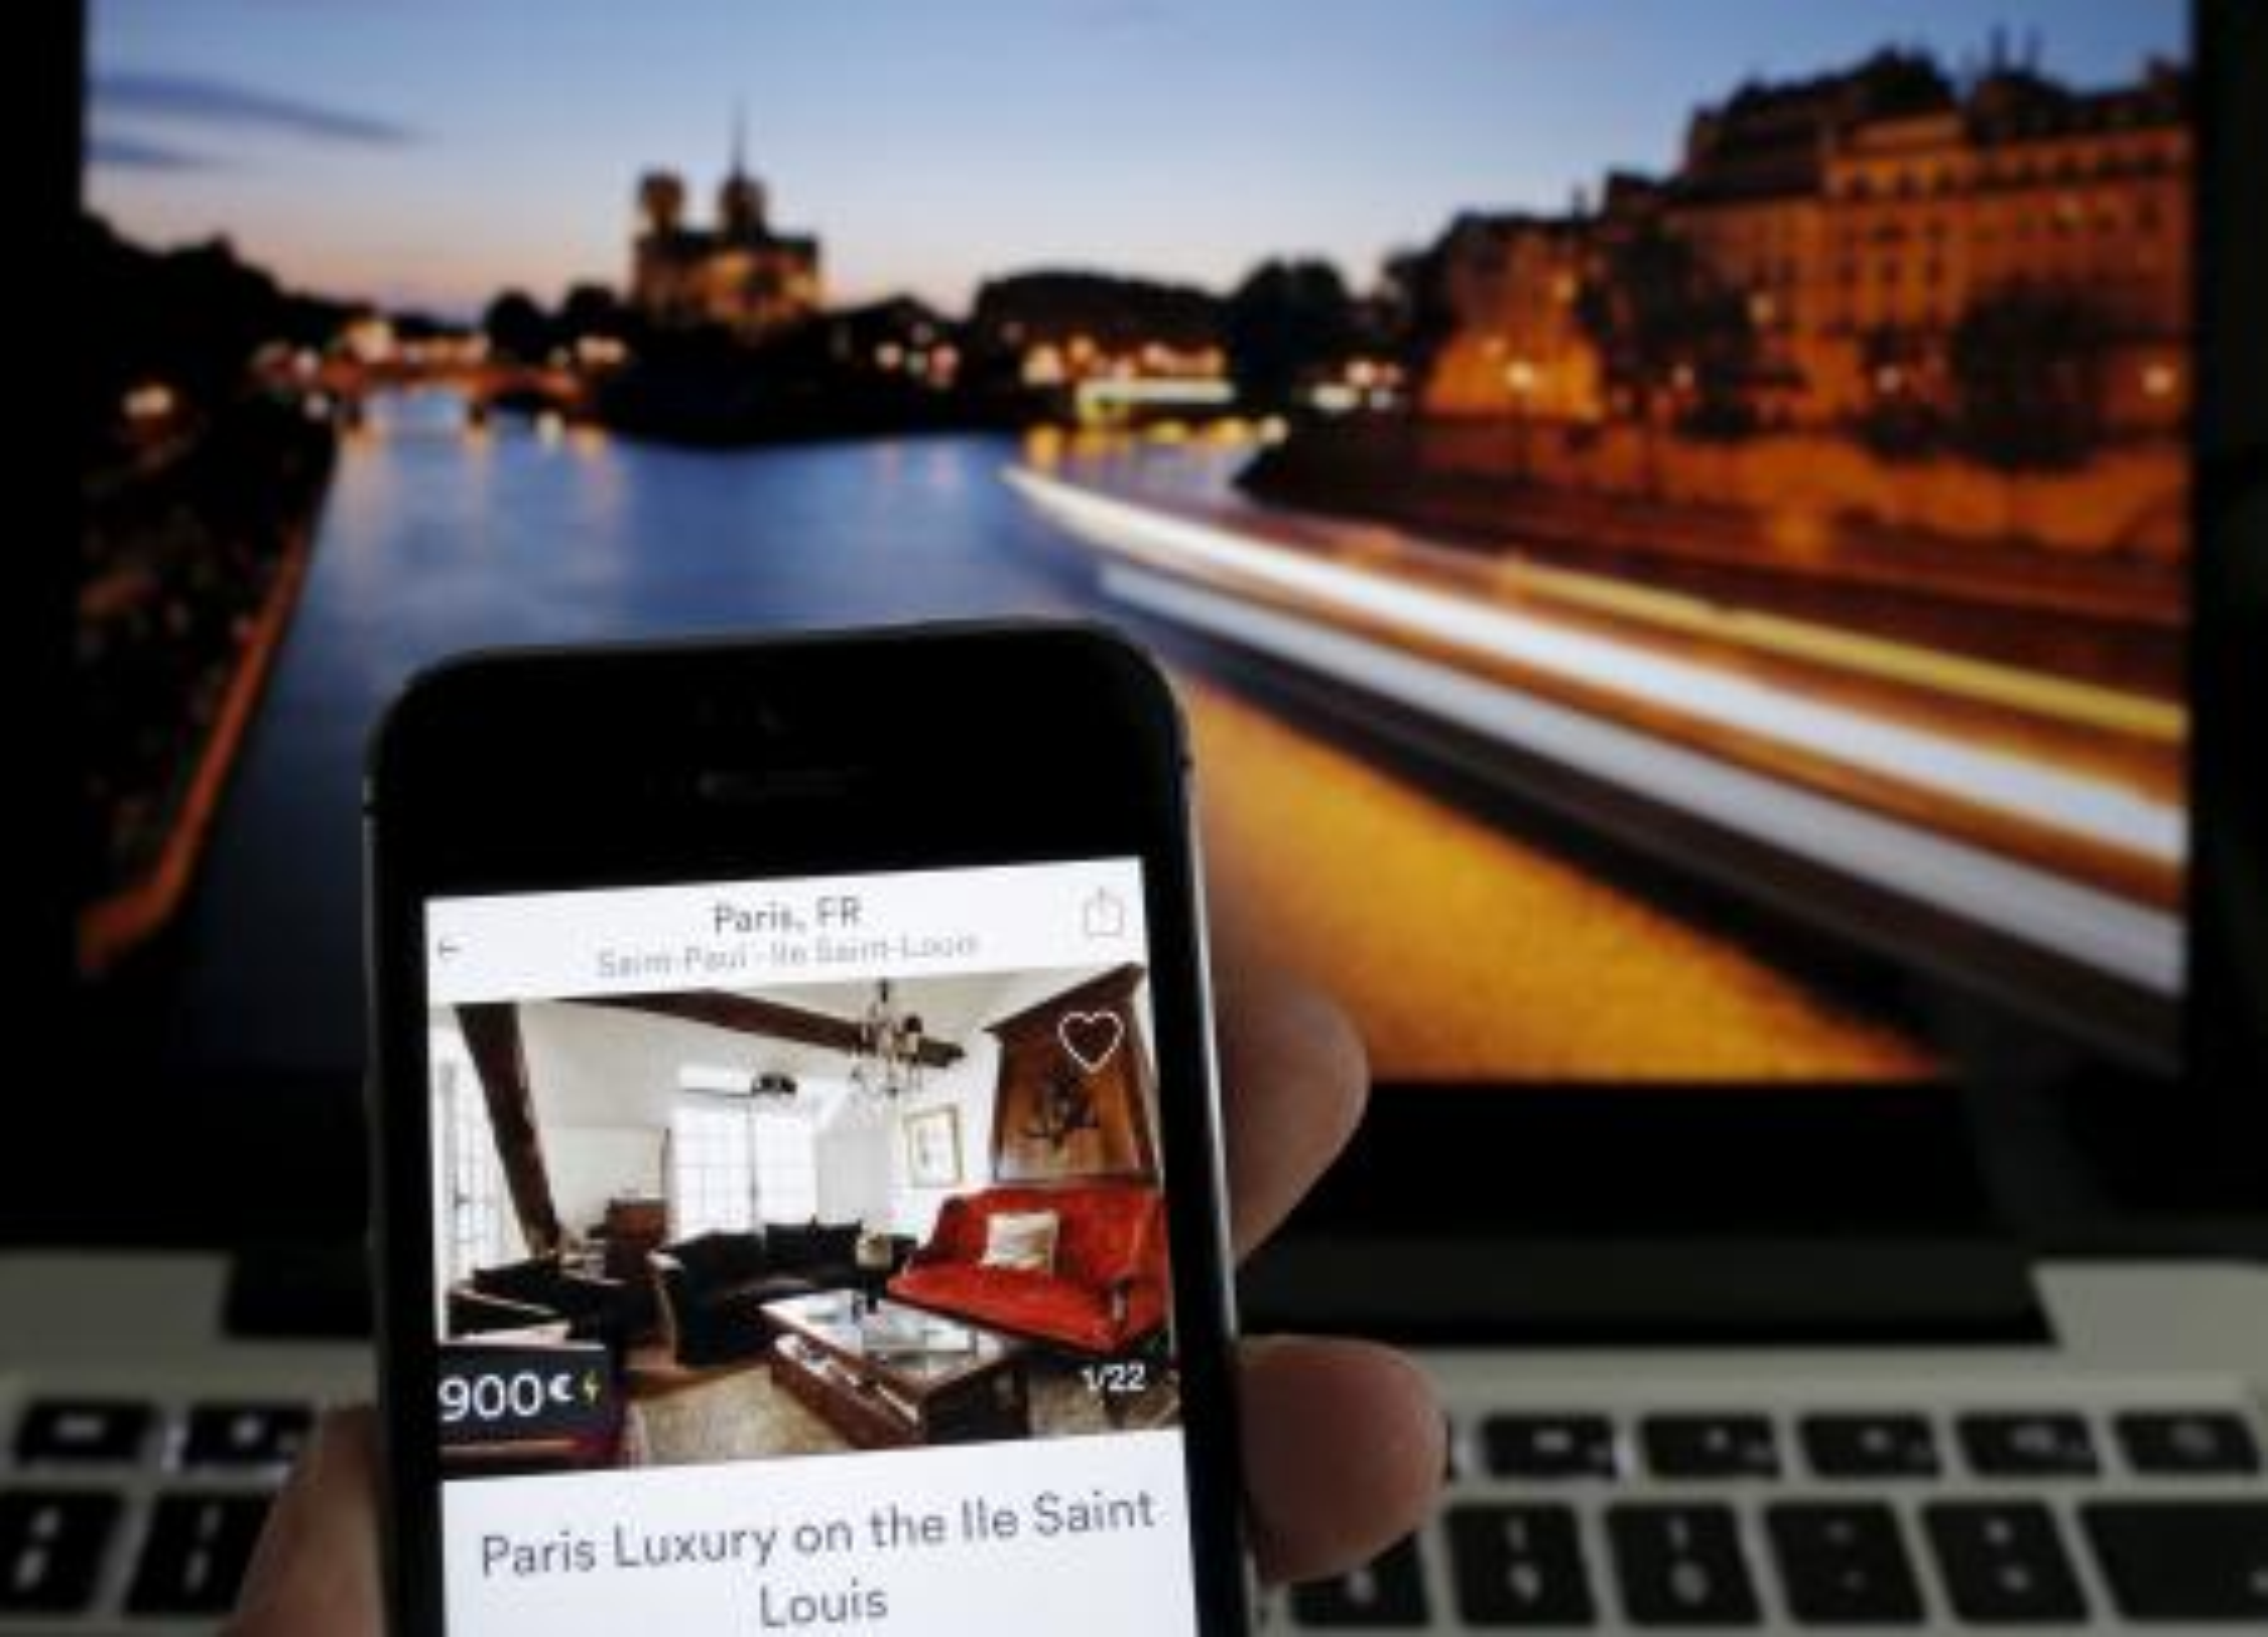 Booking an Airbnb in Paris